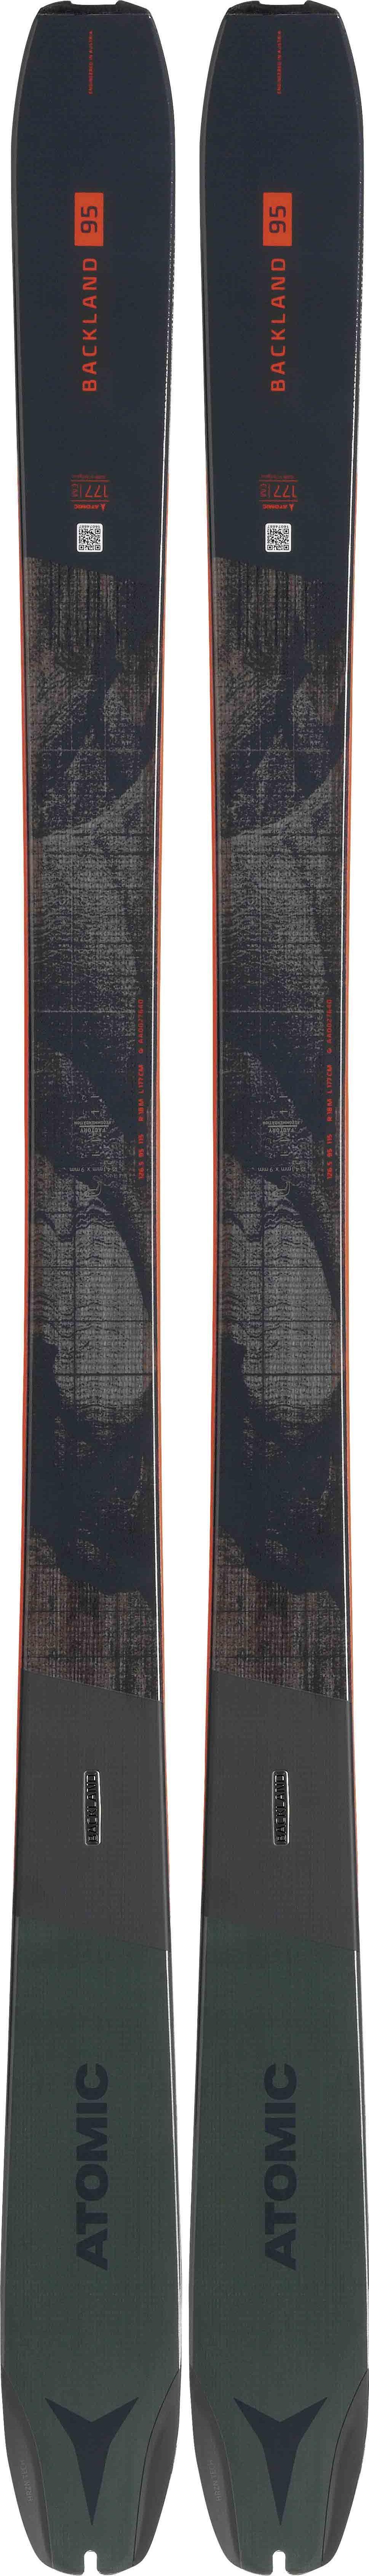 Atomic skis Backland